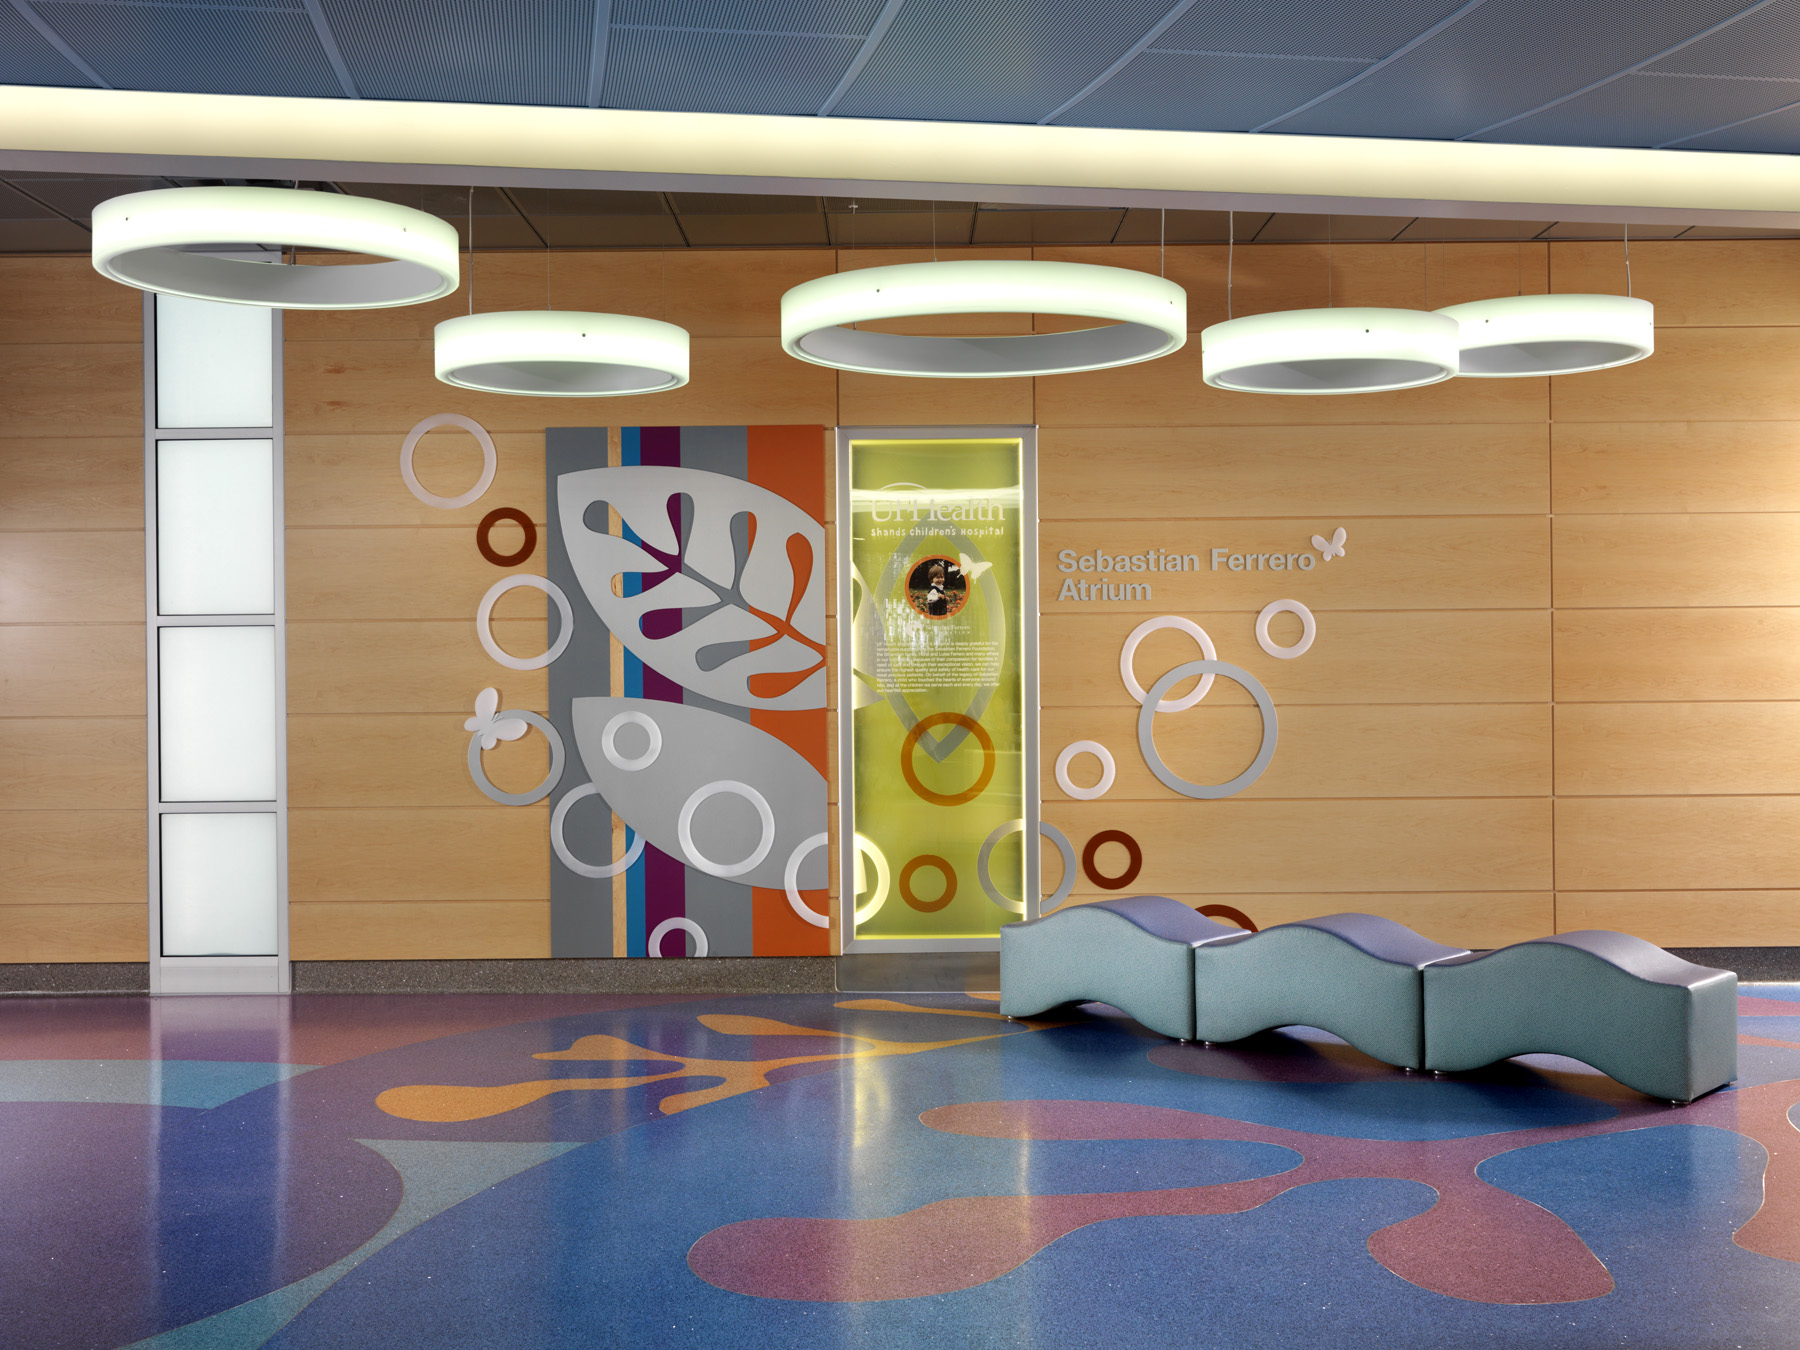 Installations Arts In Medicine Shands Healthcare Shands Healthcare University Of Florida